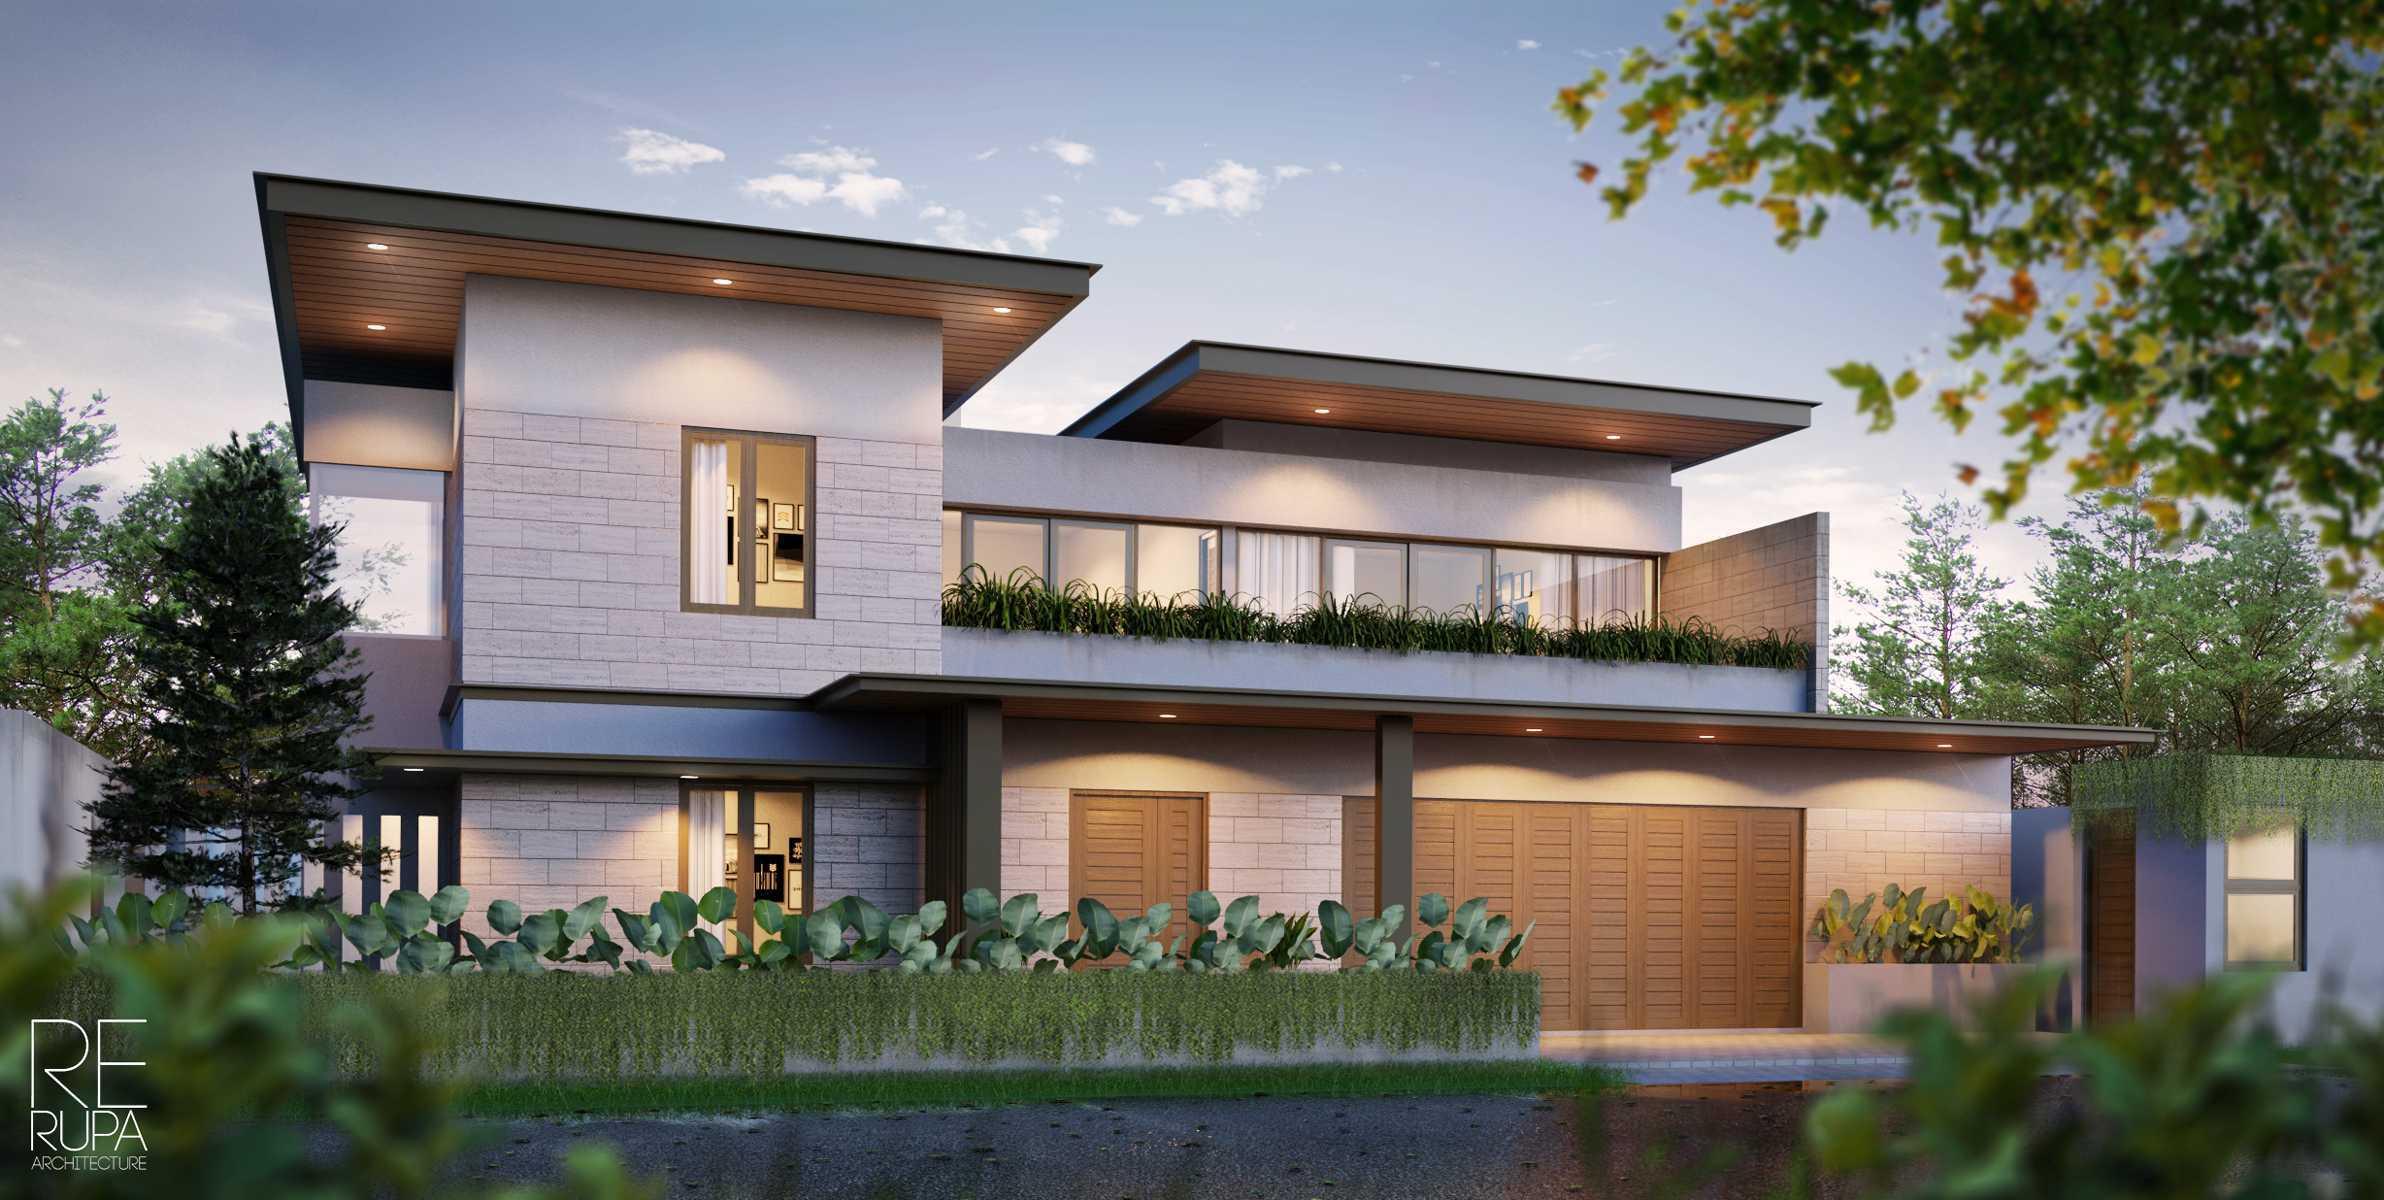 Rerupa Architecture Mr. Dw House Kota Kupang, Nusa Tenggara Tim., Indonesia Kota Kupang, Nusa Tenggara Tim., Indonesia 170724Render-Rumah-Donny2 Modern  37003